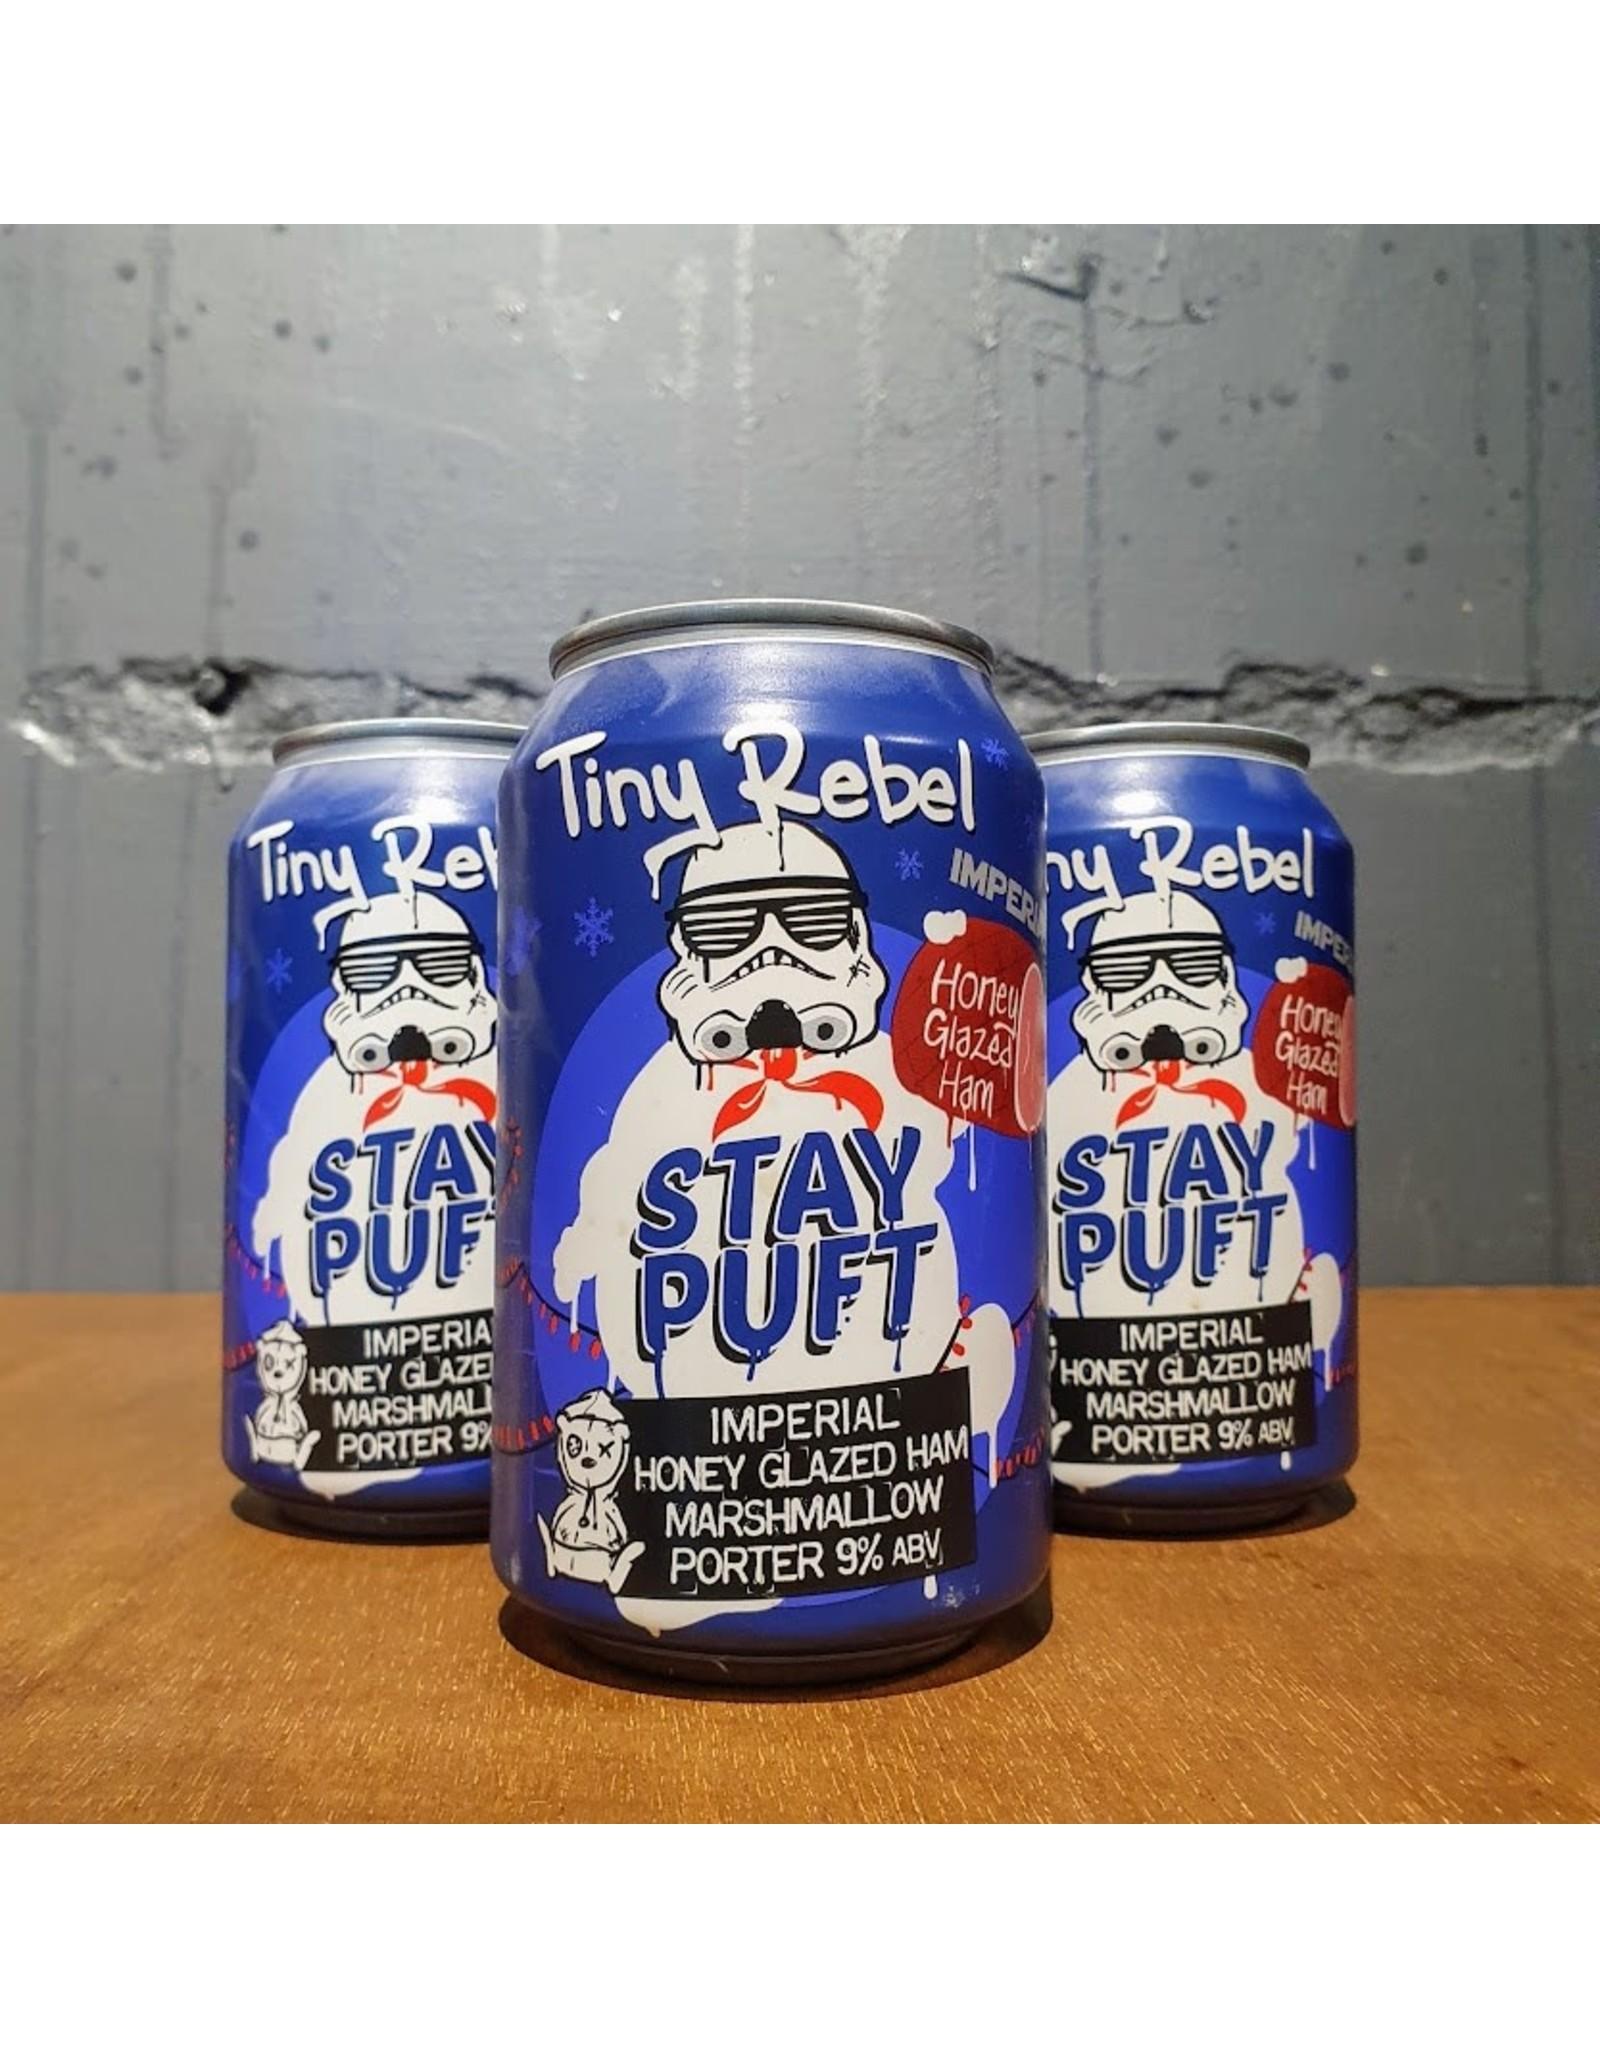 Tiny Rebel:  Stay Puft Imperial Honey Glazed Ham Edition